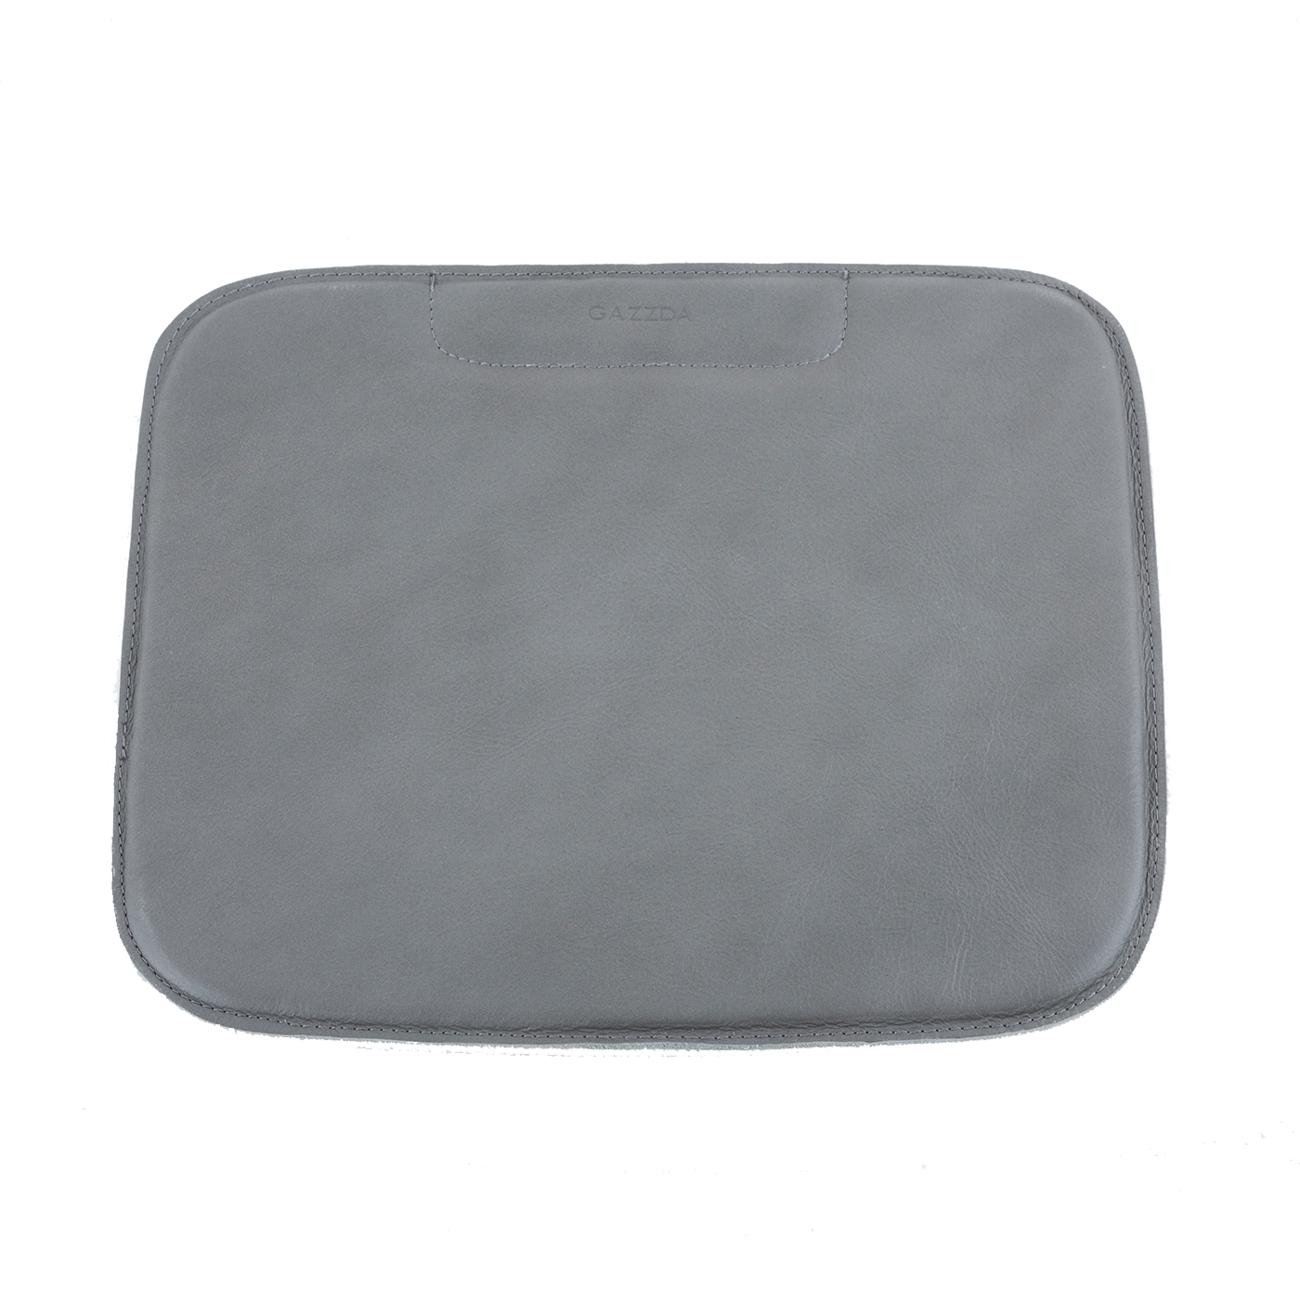 https://www.fundesign.nl/media/catalog/product/g/a/gazzda-zitkussen-voor-leina-bar-chair-dakar-34_grey.png